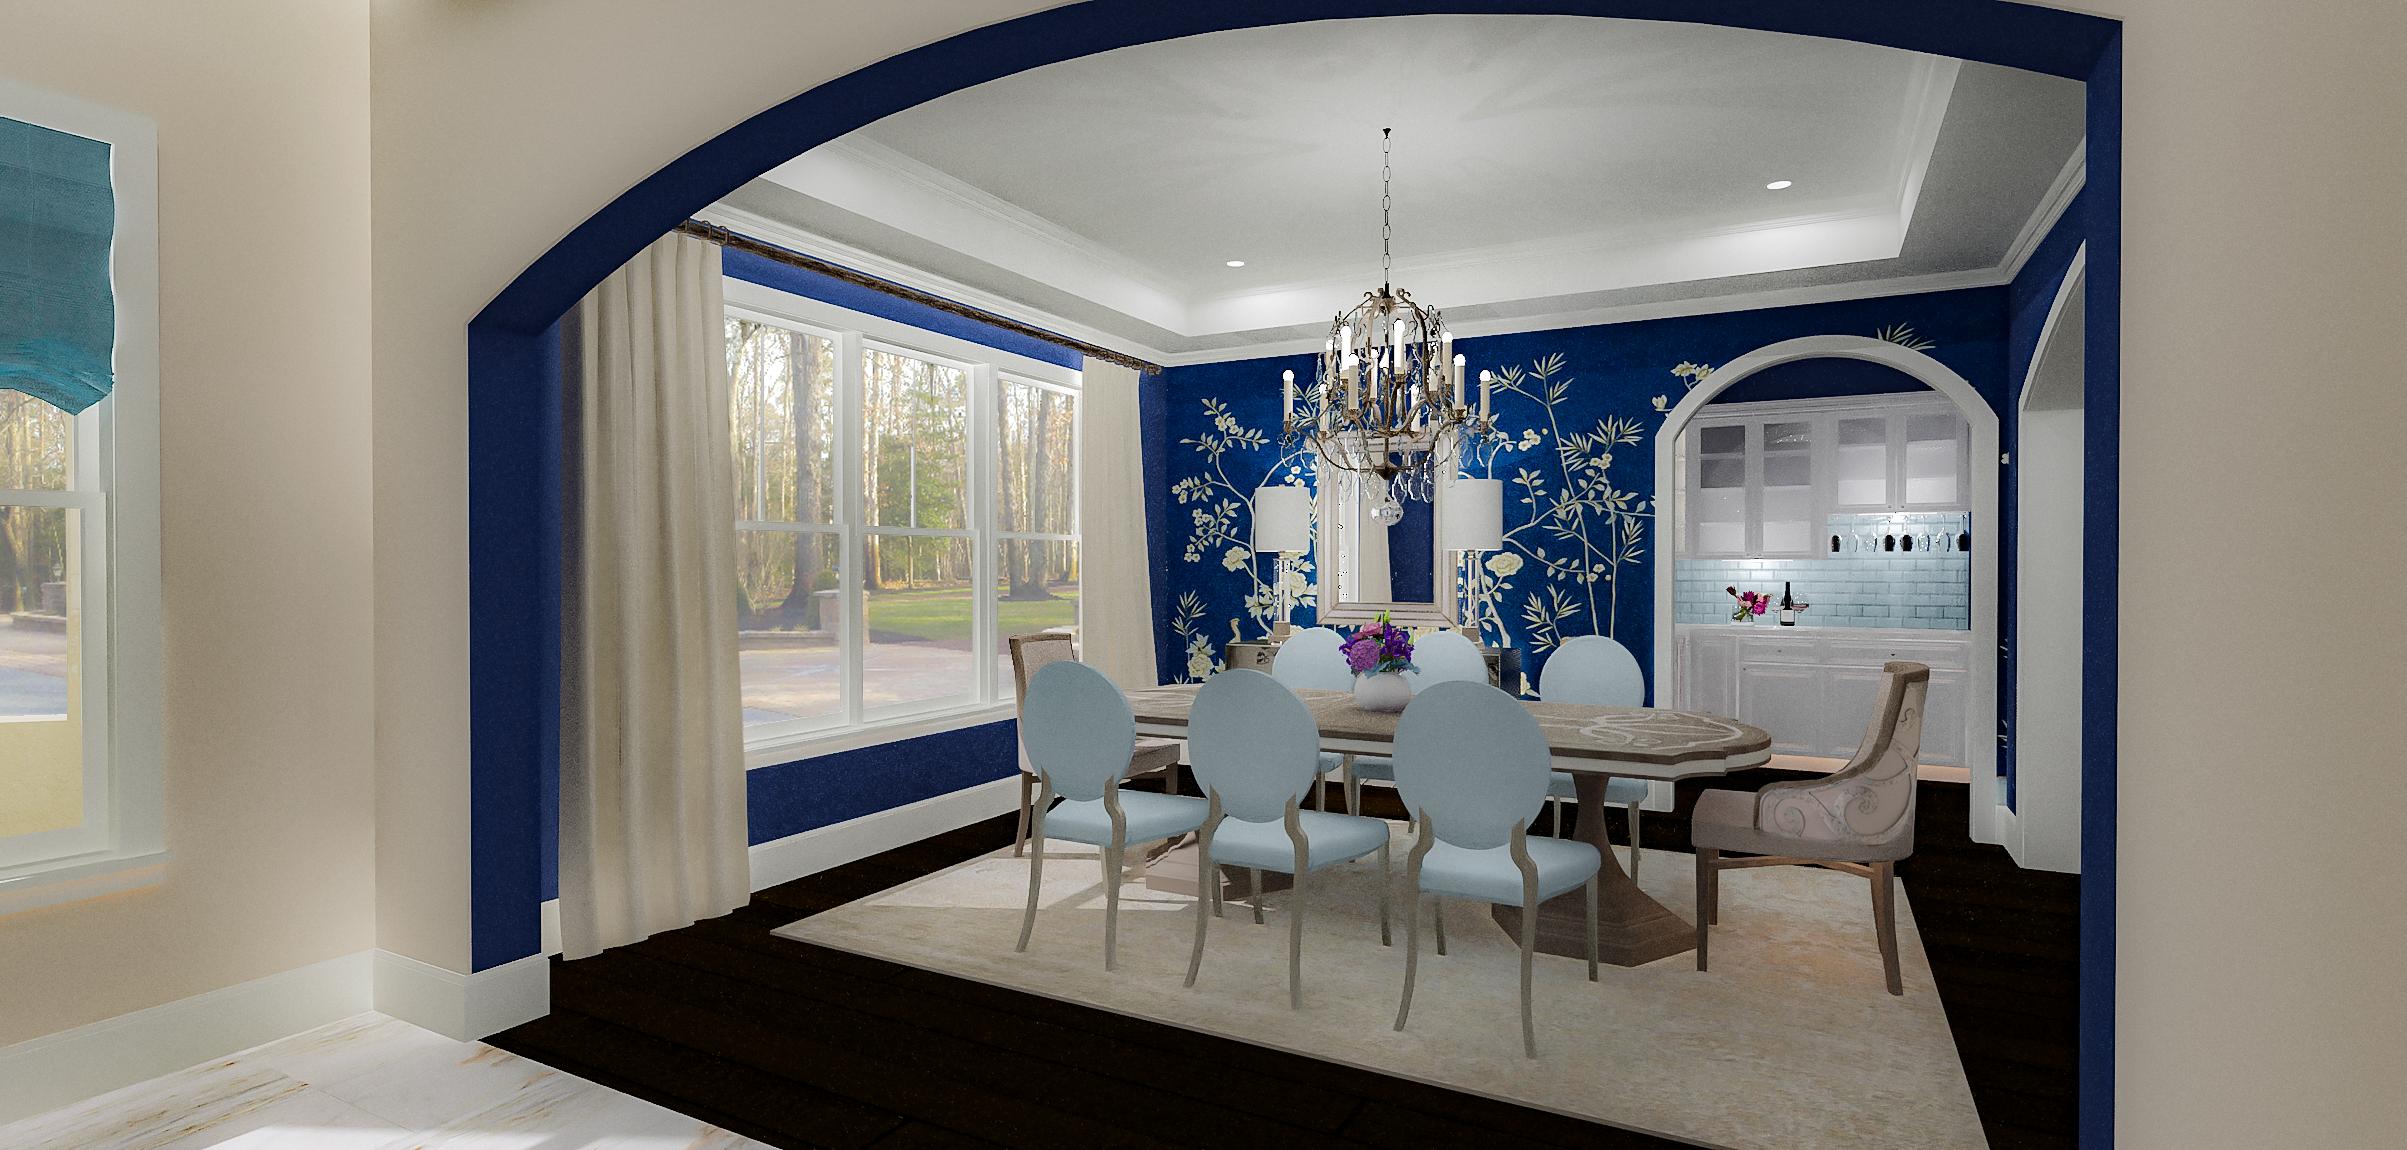 Formal Dining Room Rendering   Designed by Jane Anne Designs.png